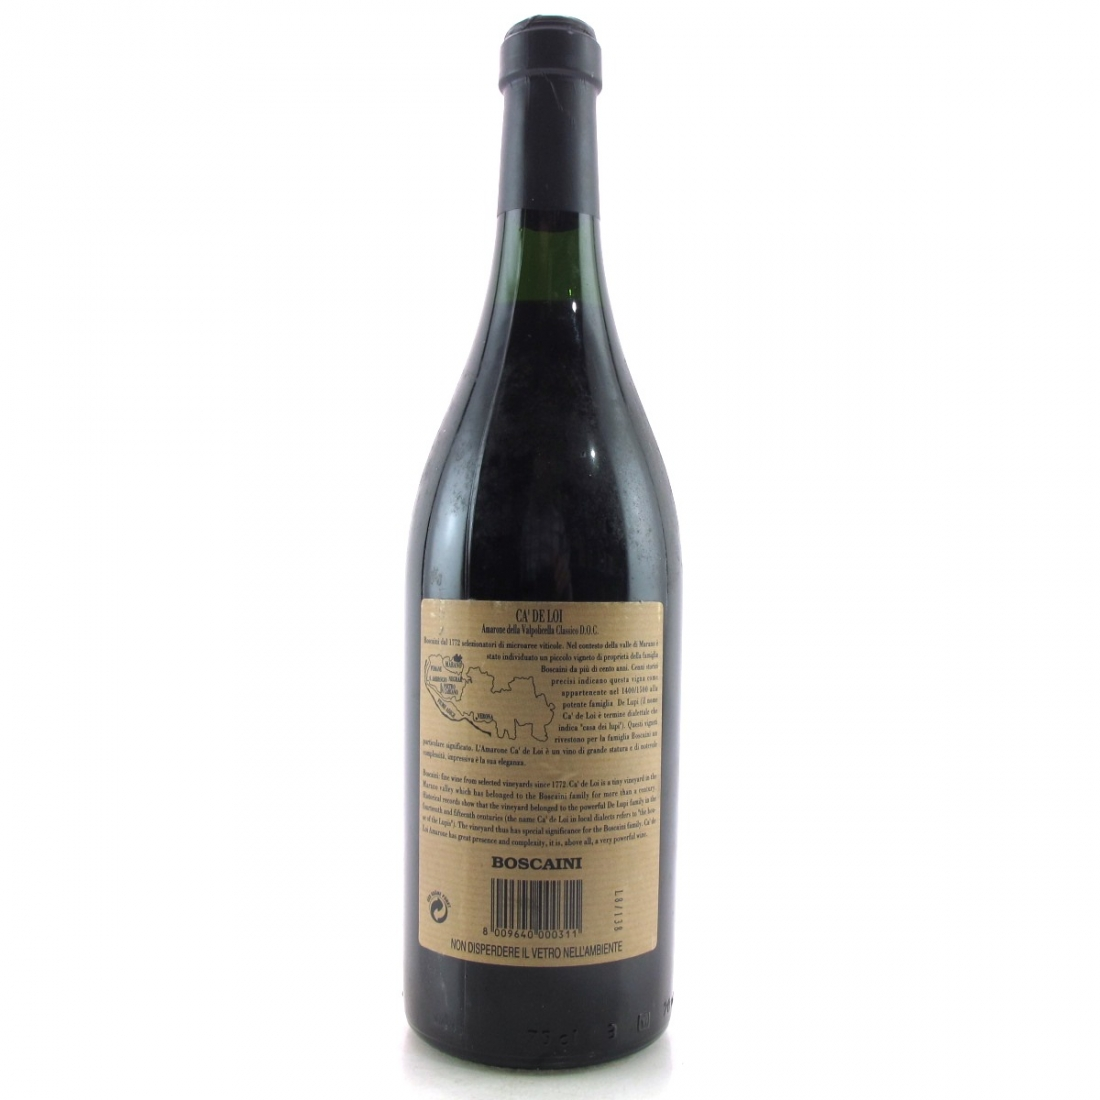 Boscaini 1993 Amarone